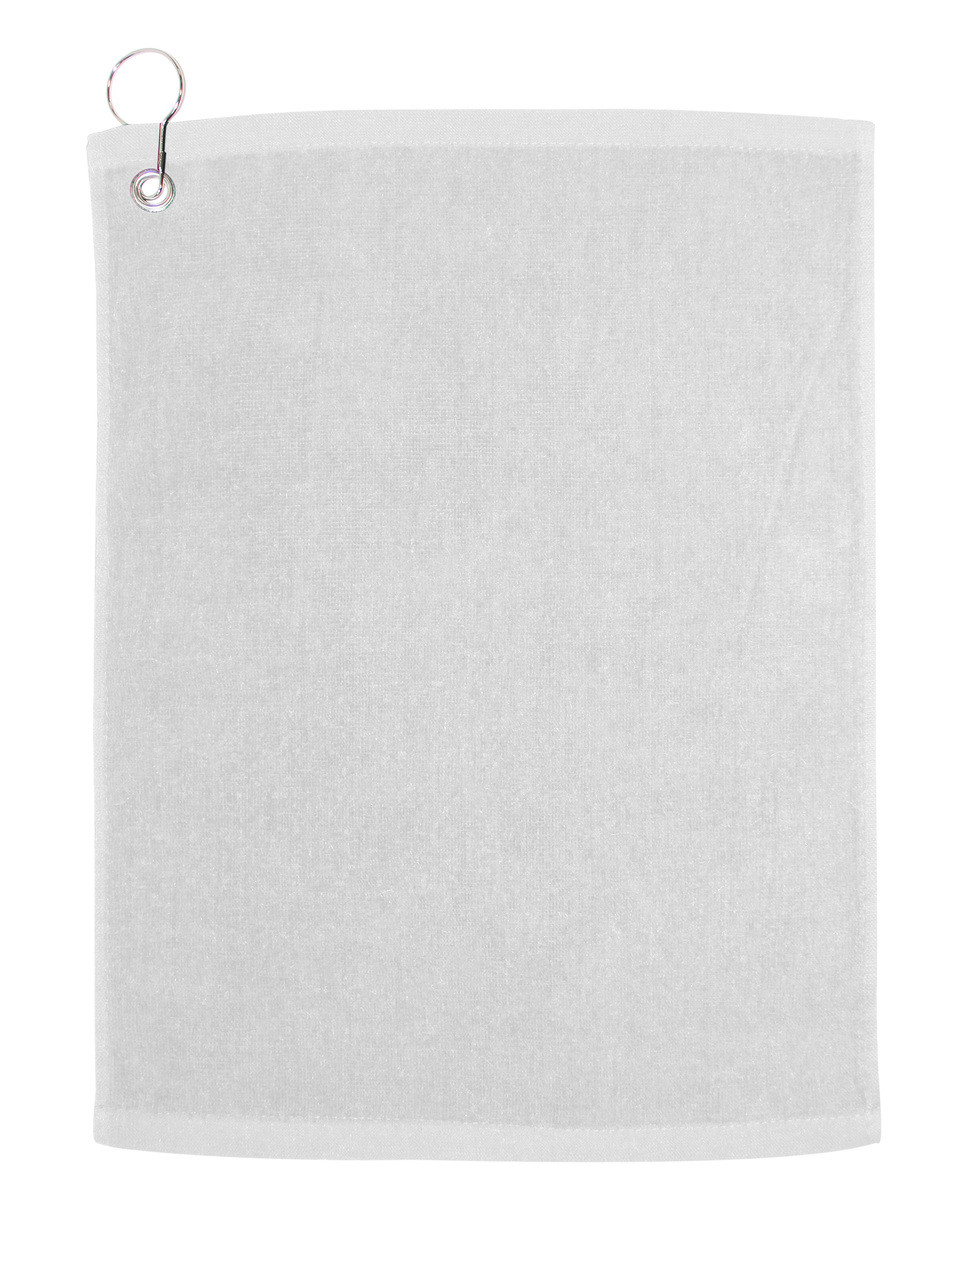 C1518GH Velour Hemmed Towel with Corner Grommet /& Hook Carmel Towel Company